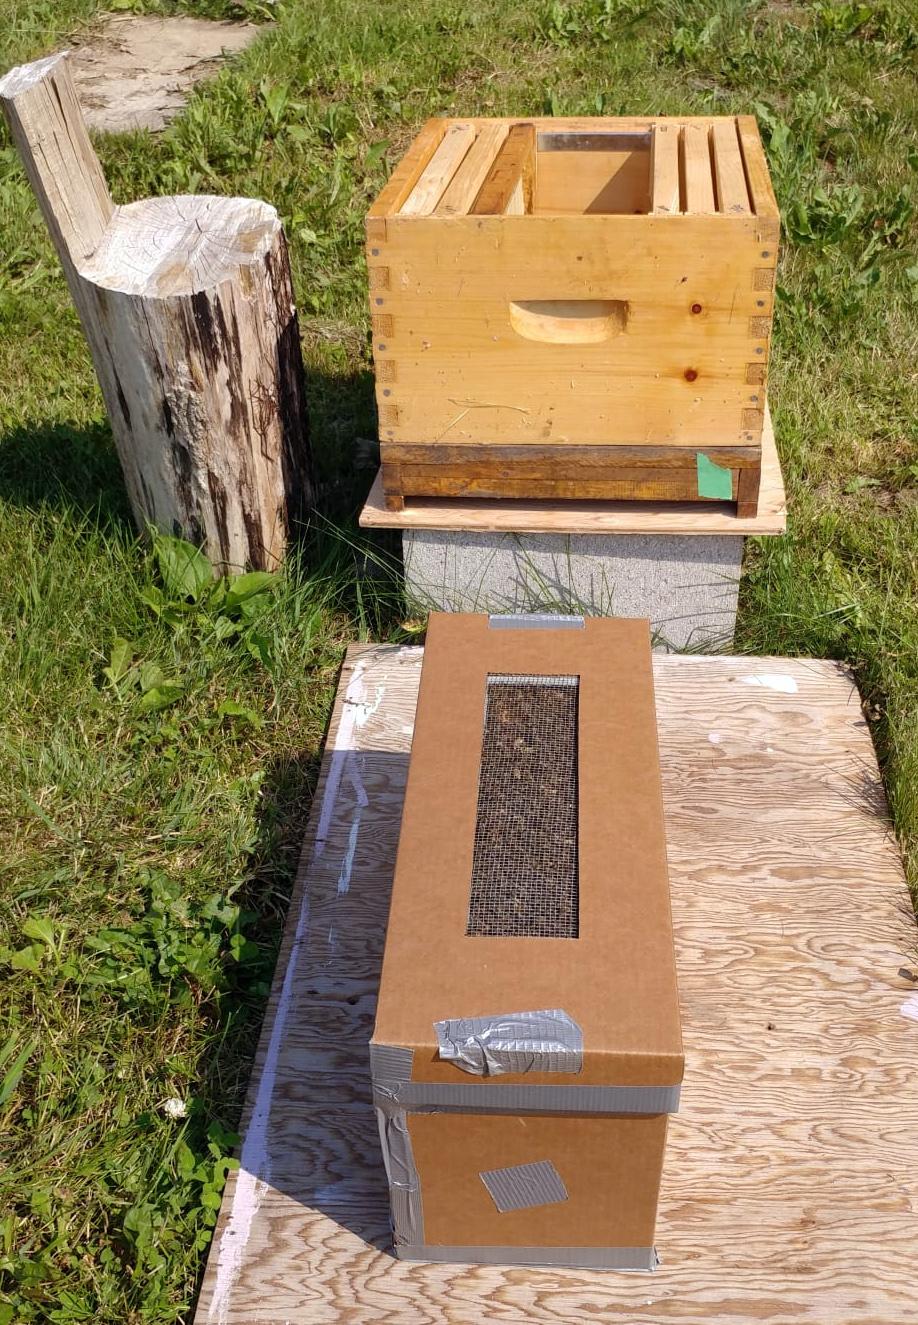 New hive in cardboard box